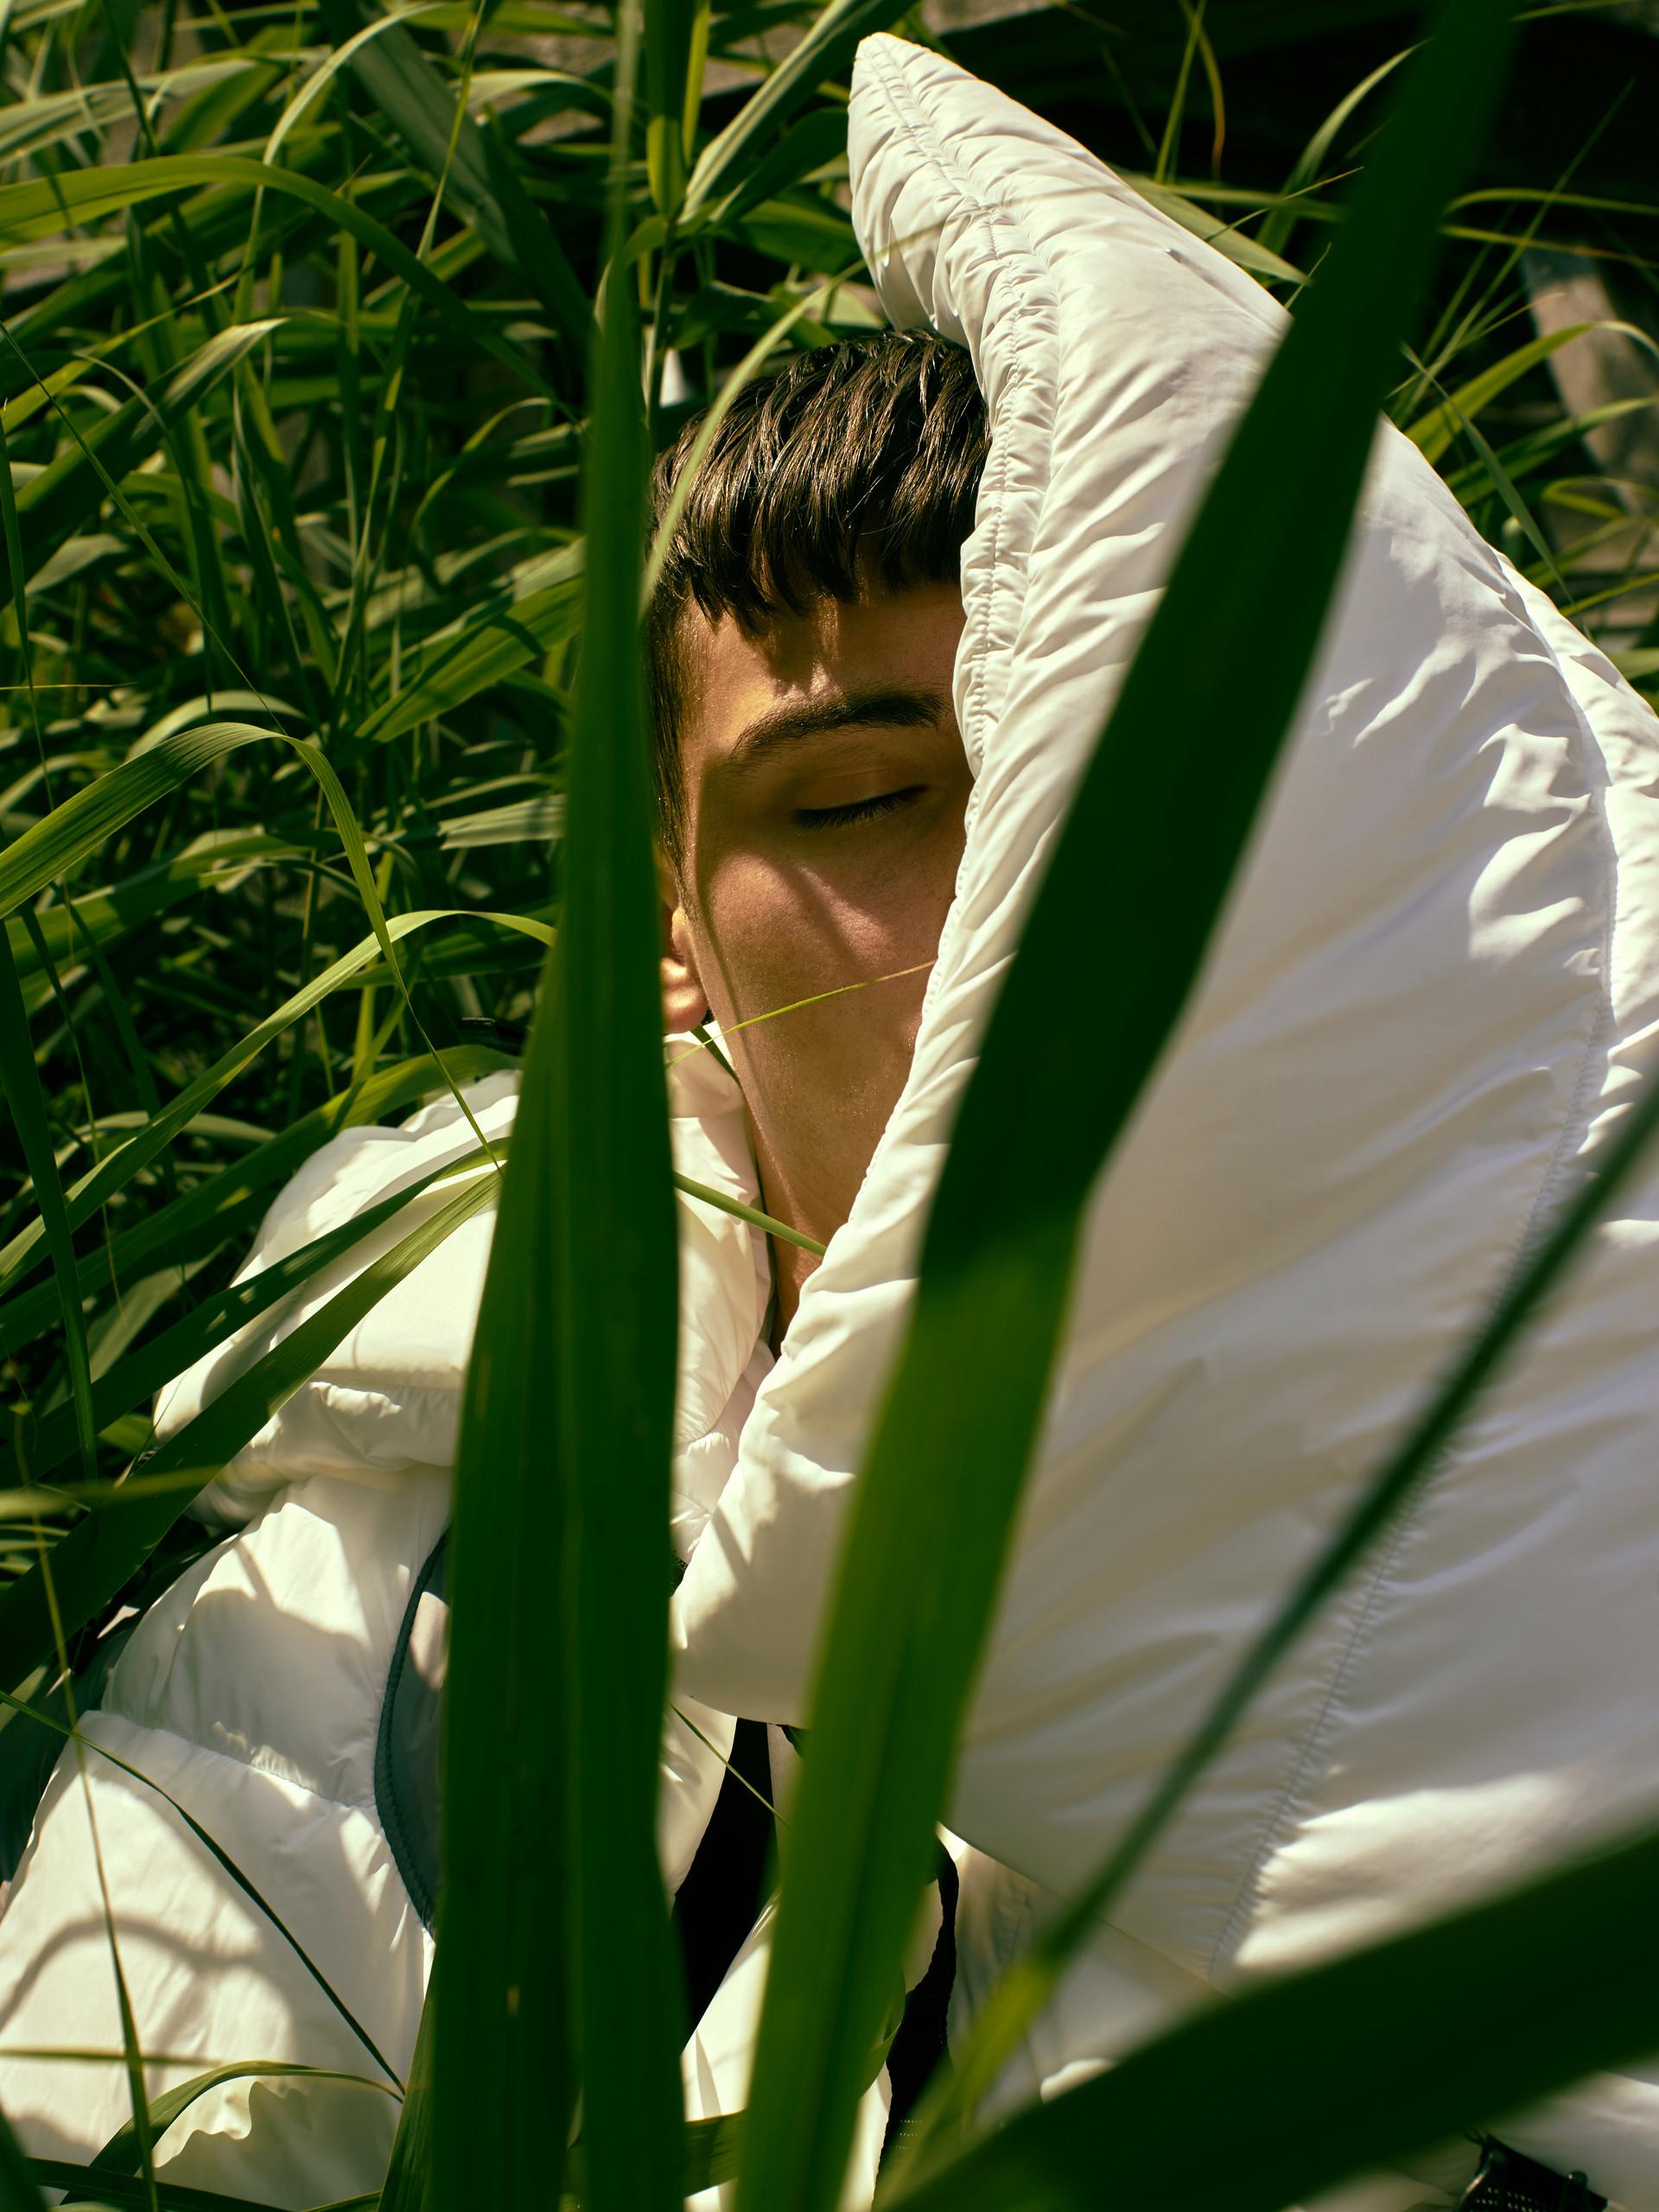 01_In my leady garden_CF207167.jpg